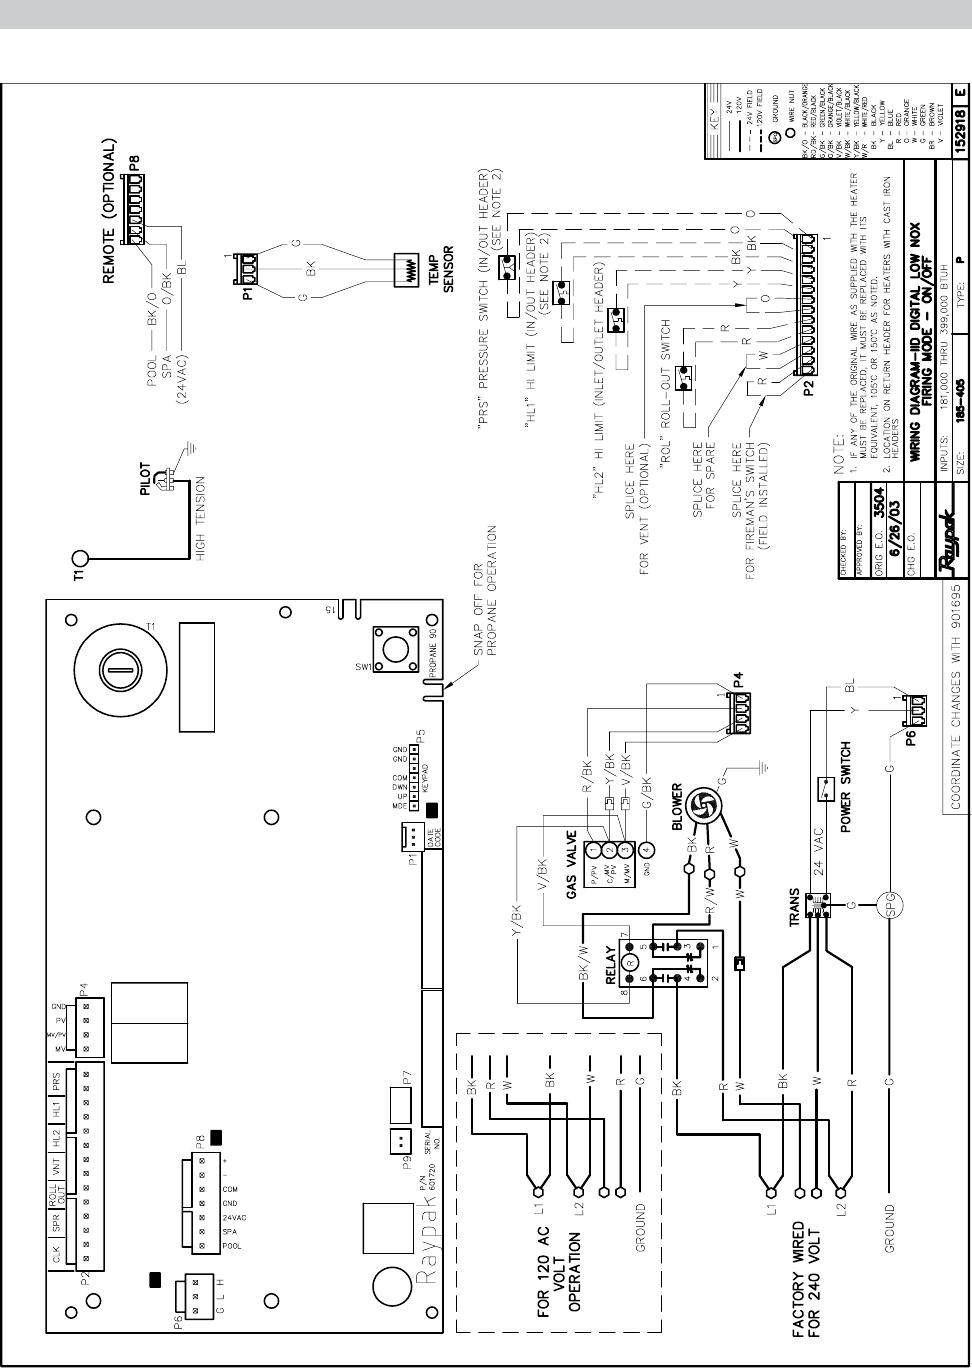 raypak wiring diagram wire center u2022 rh efluencia co Spa Pool Heater Raypak RP2100 Raypak RP2100 Pool Heater